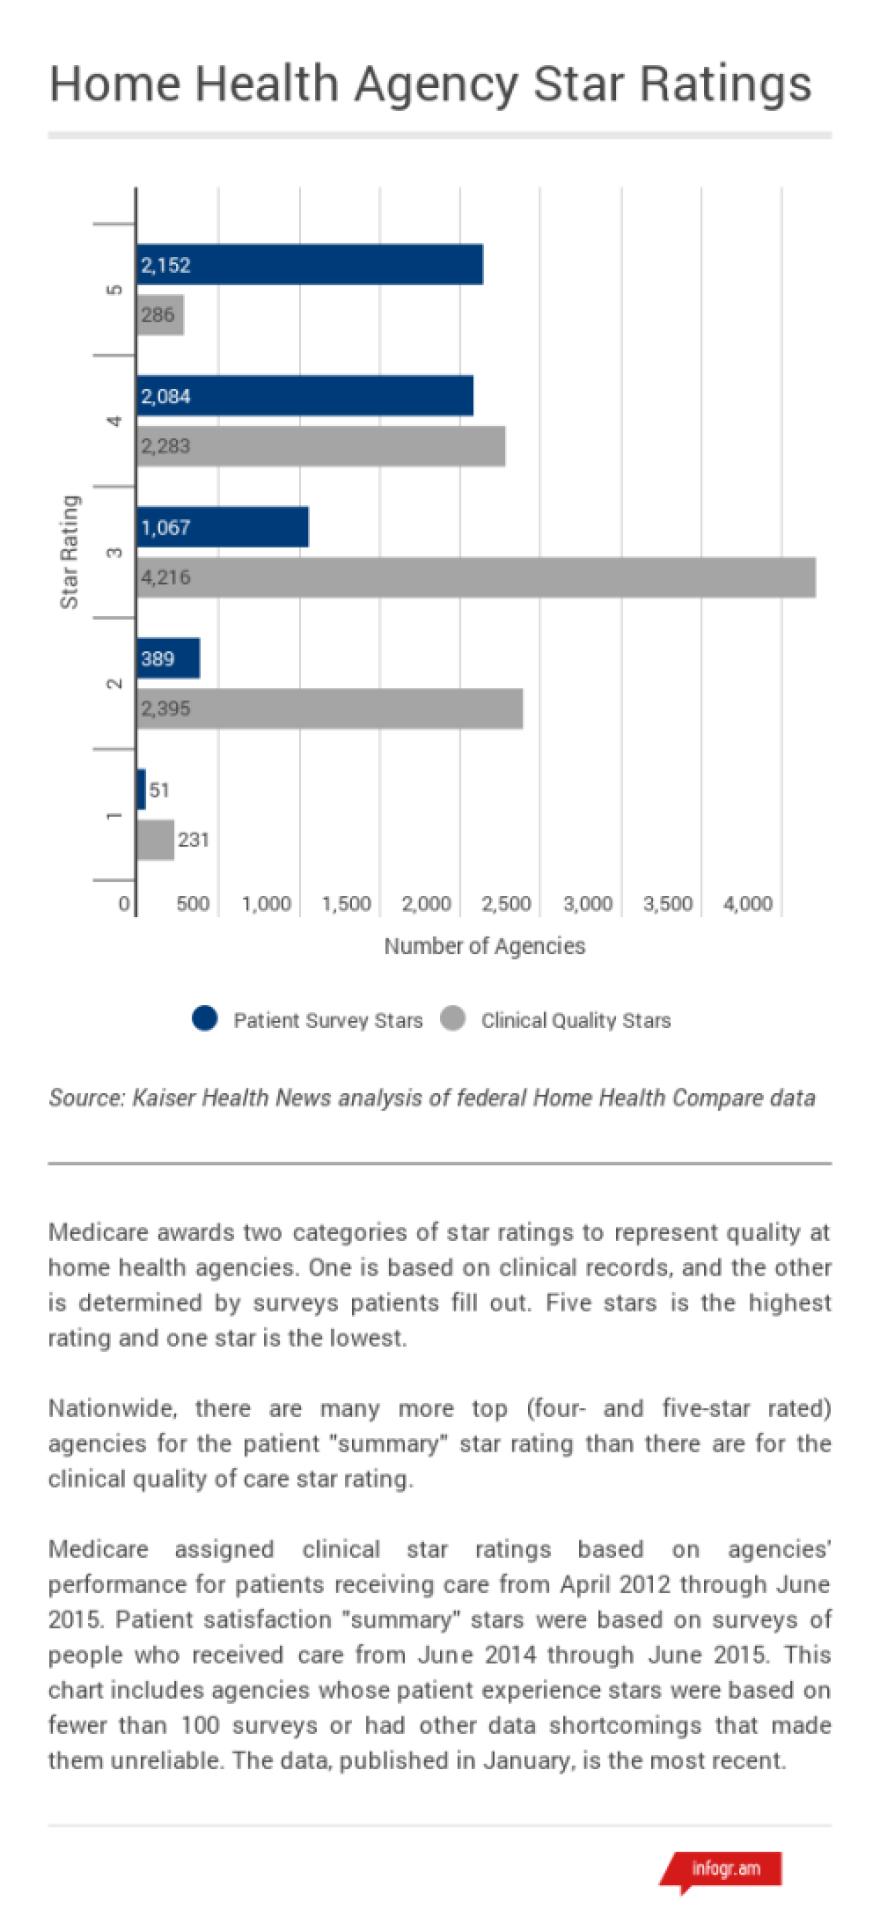 natl_home_health_star_ratings_022216.png